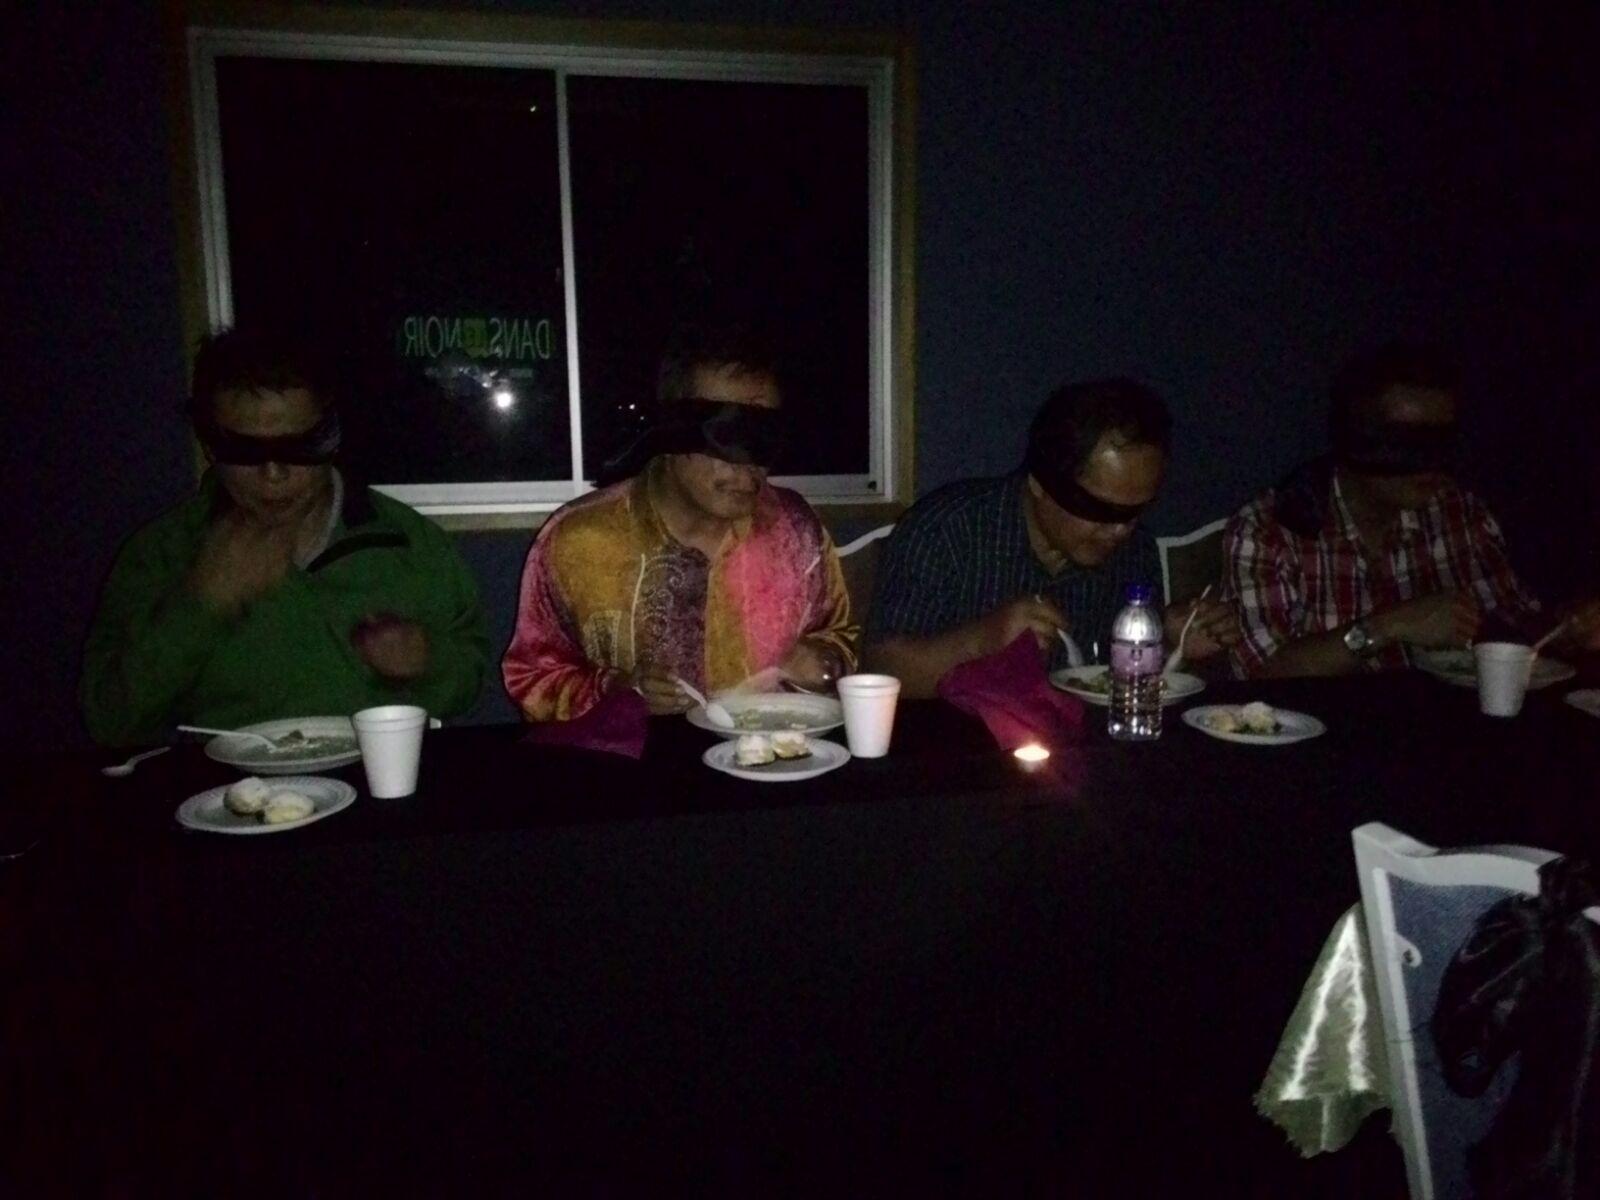 dans le noir Rahim dining in the dark